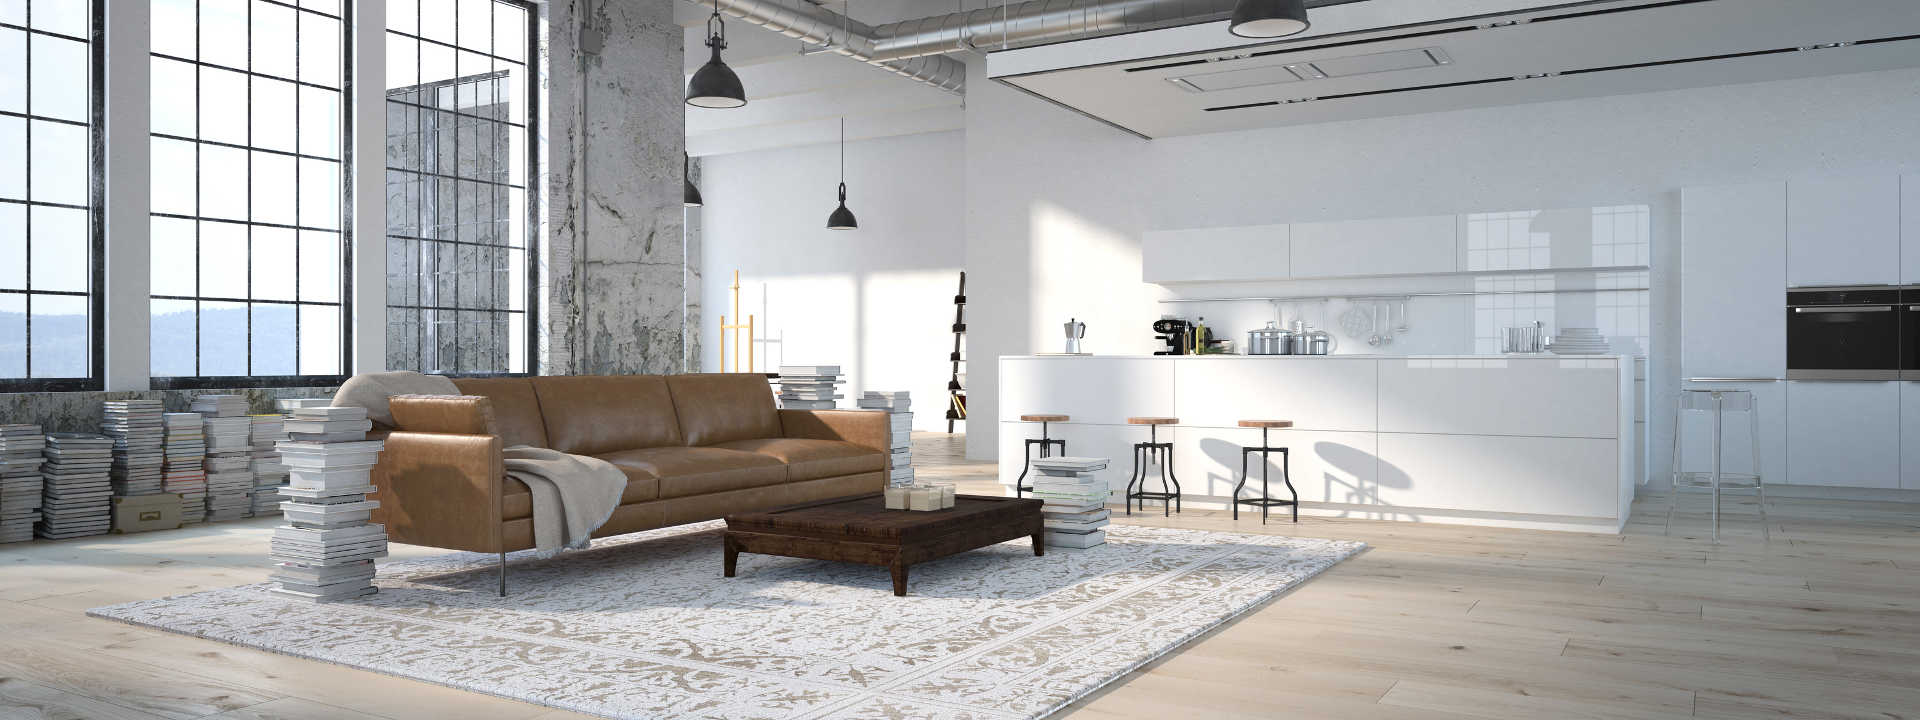 christian-fexer-immobilien-wuerzburg-loft-braune-couch-weisse-kuechenzeile